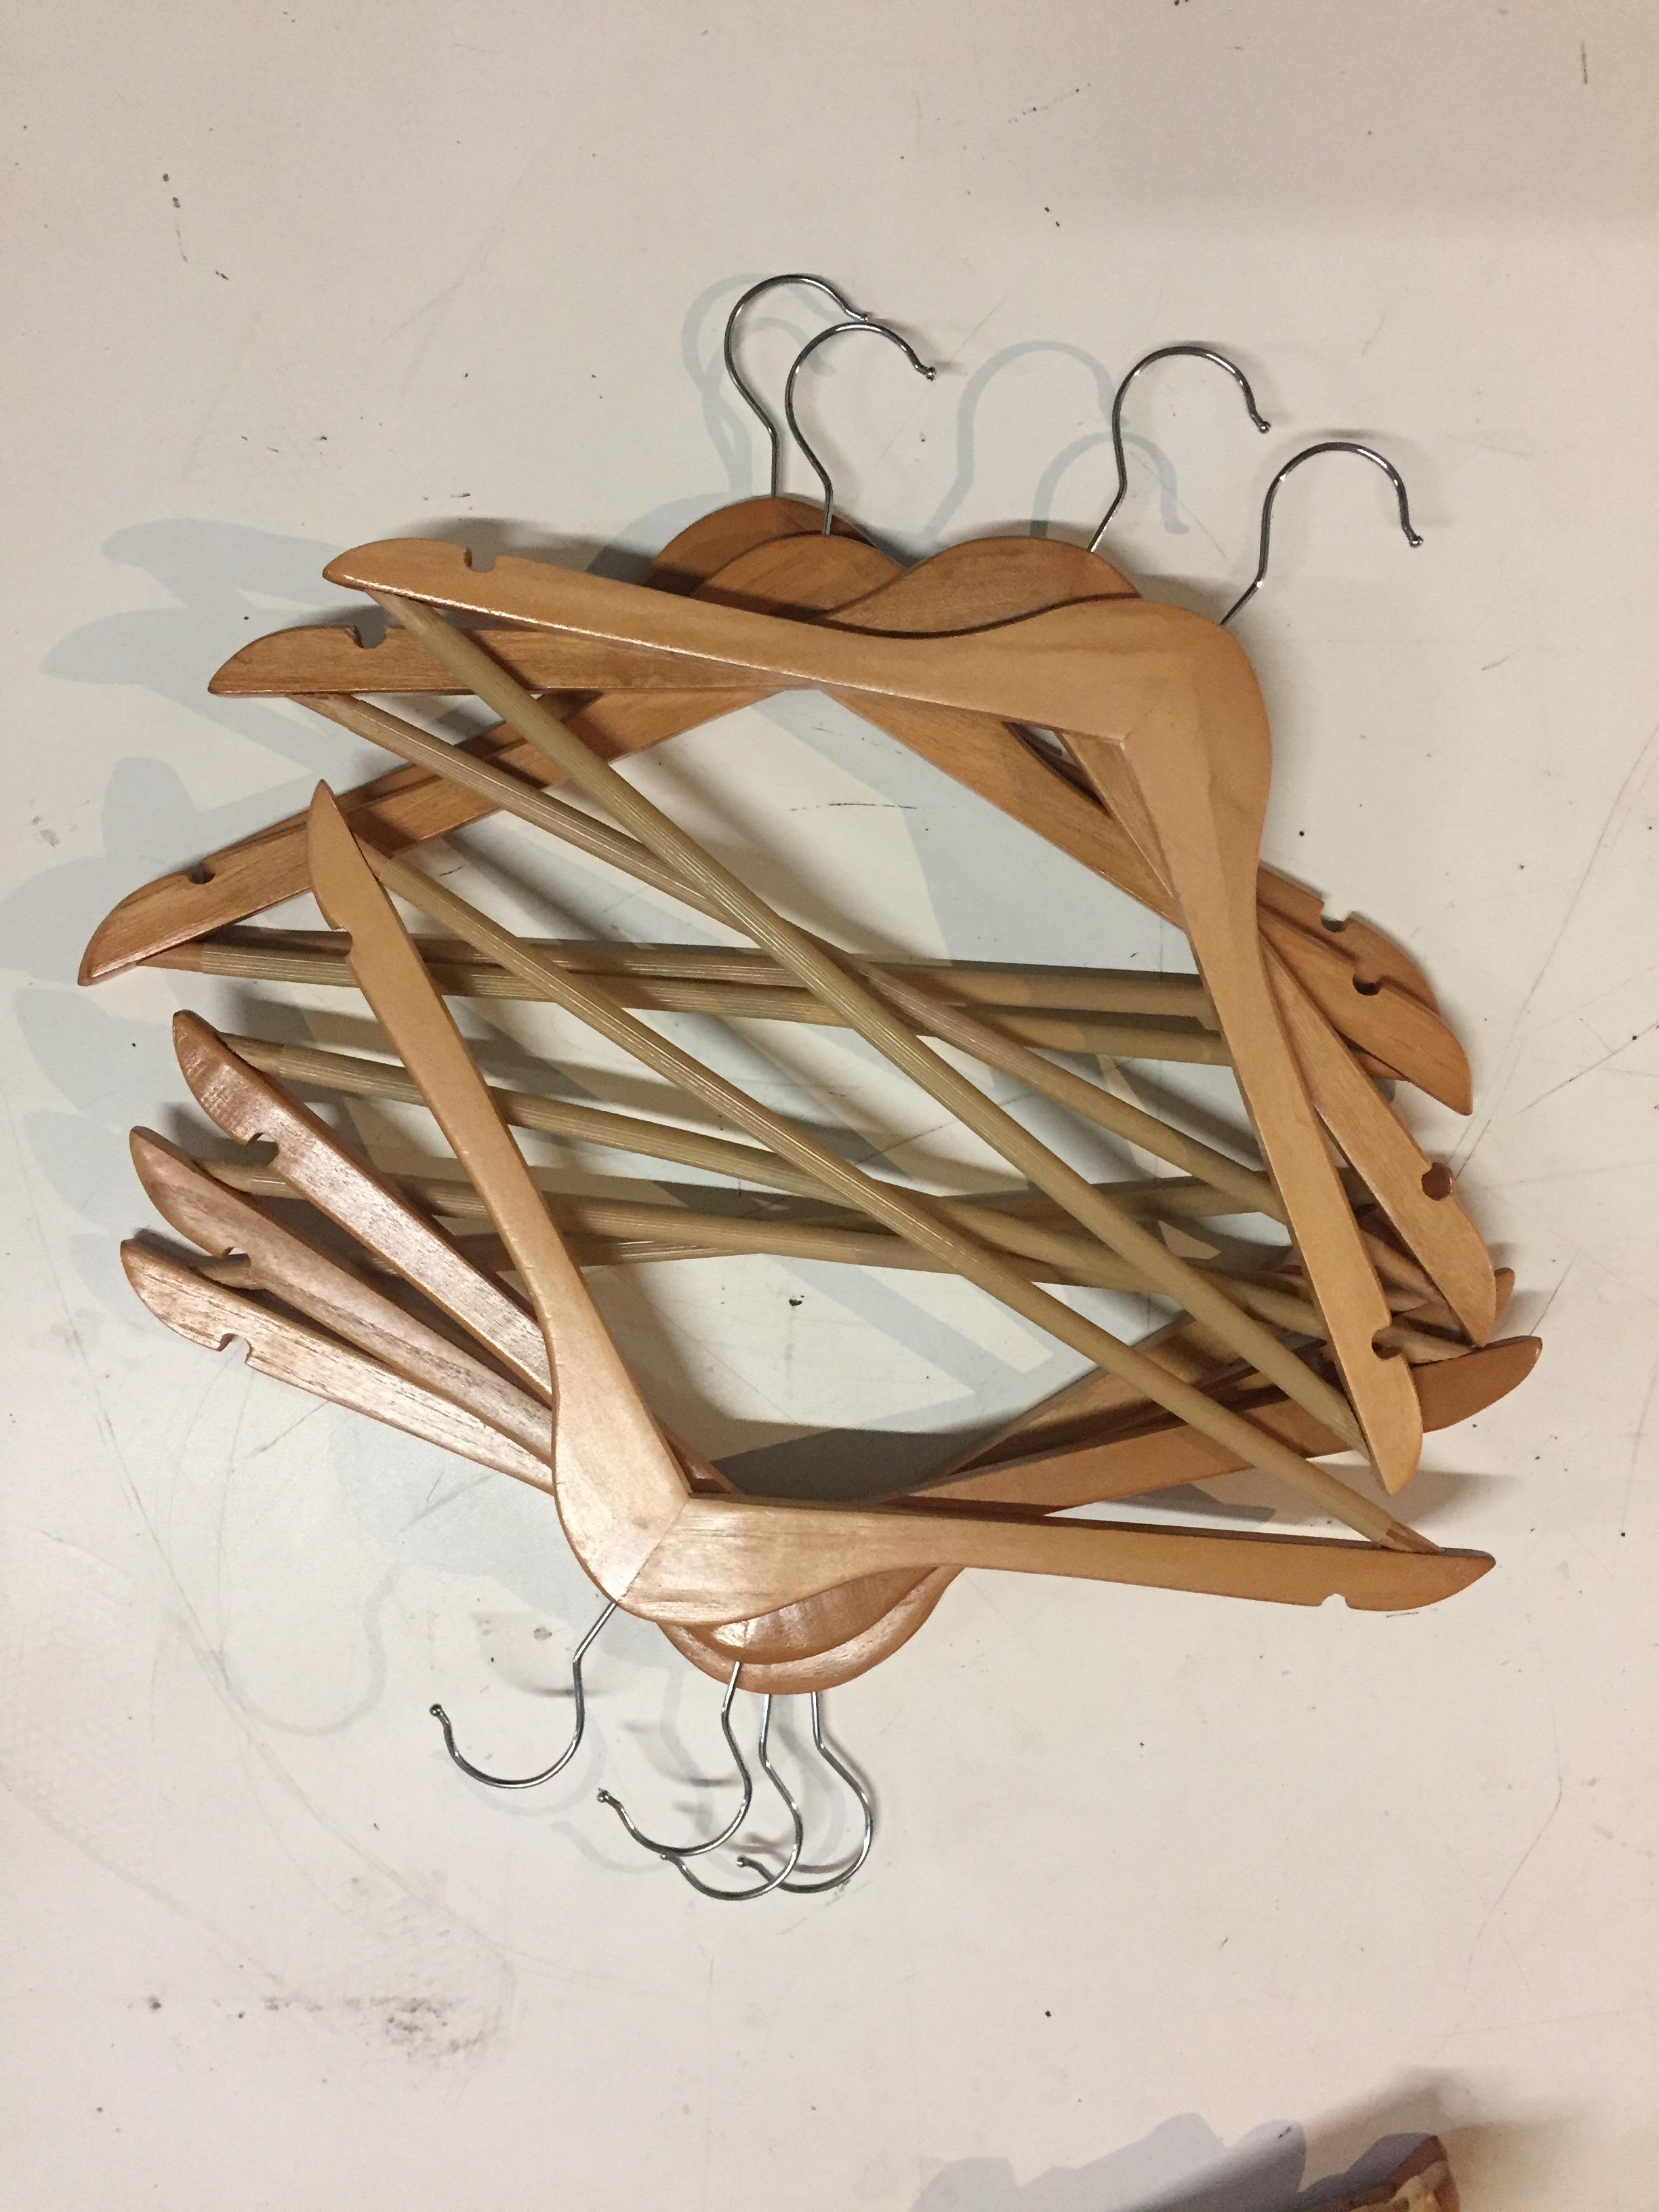 Picture of Wooden Hangers